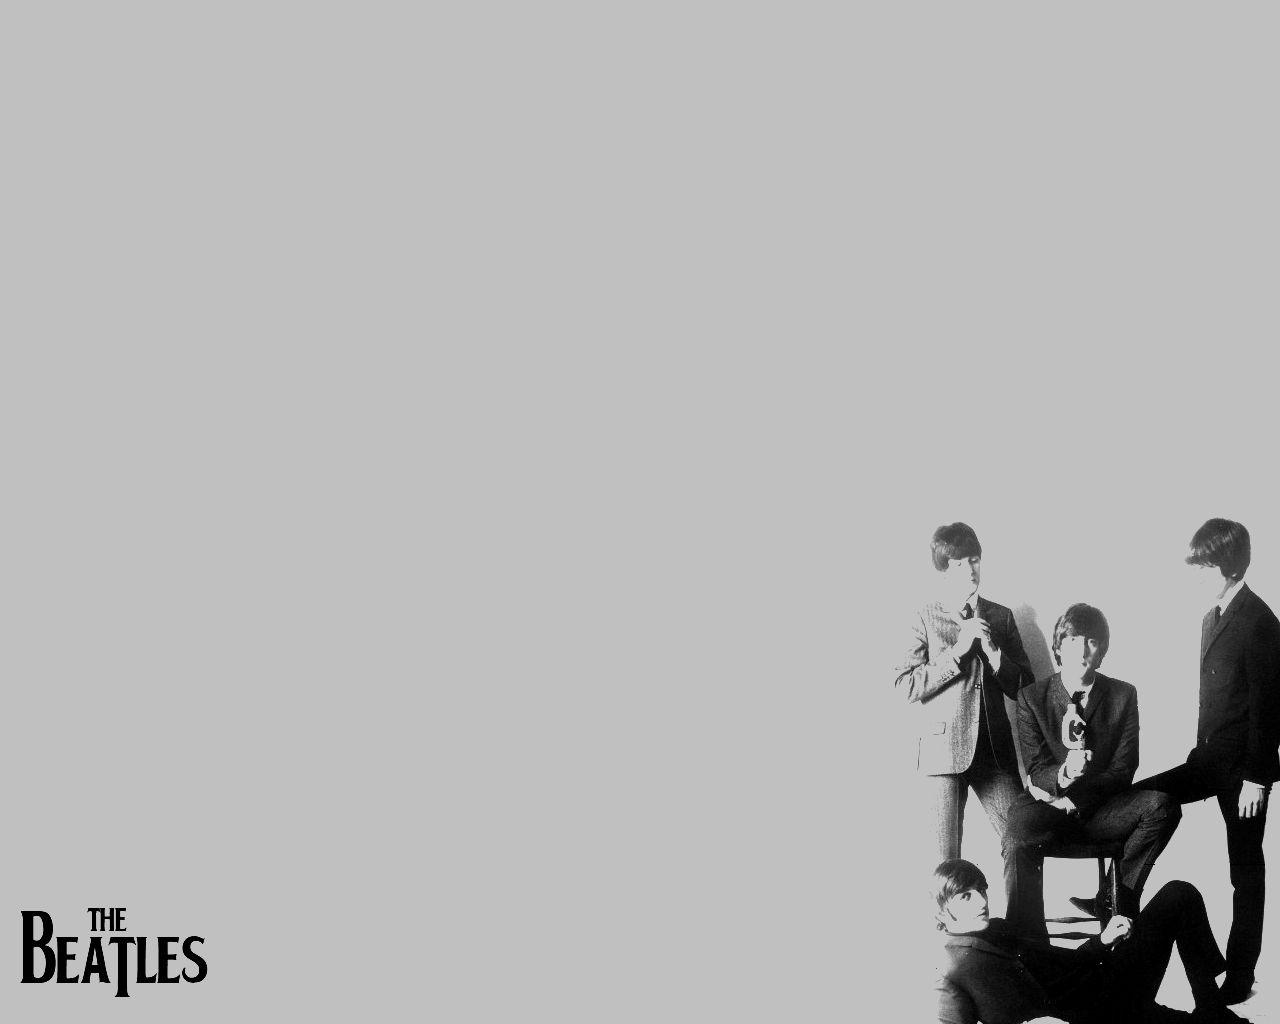 The Beatles Wallpaper Hd